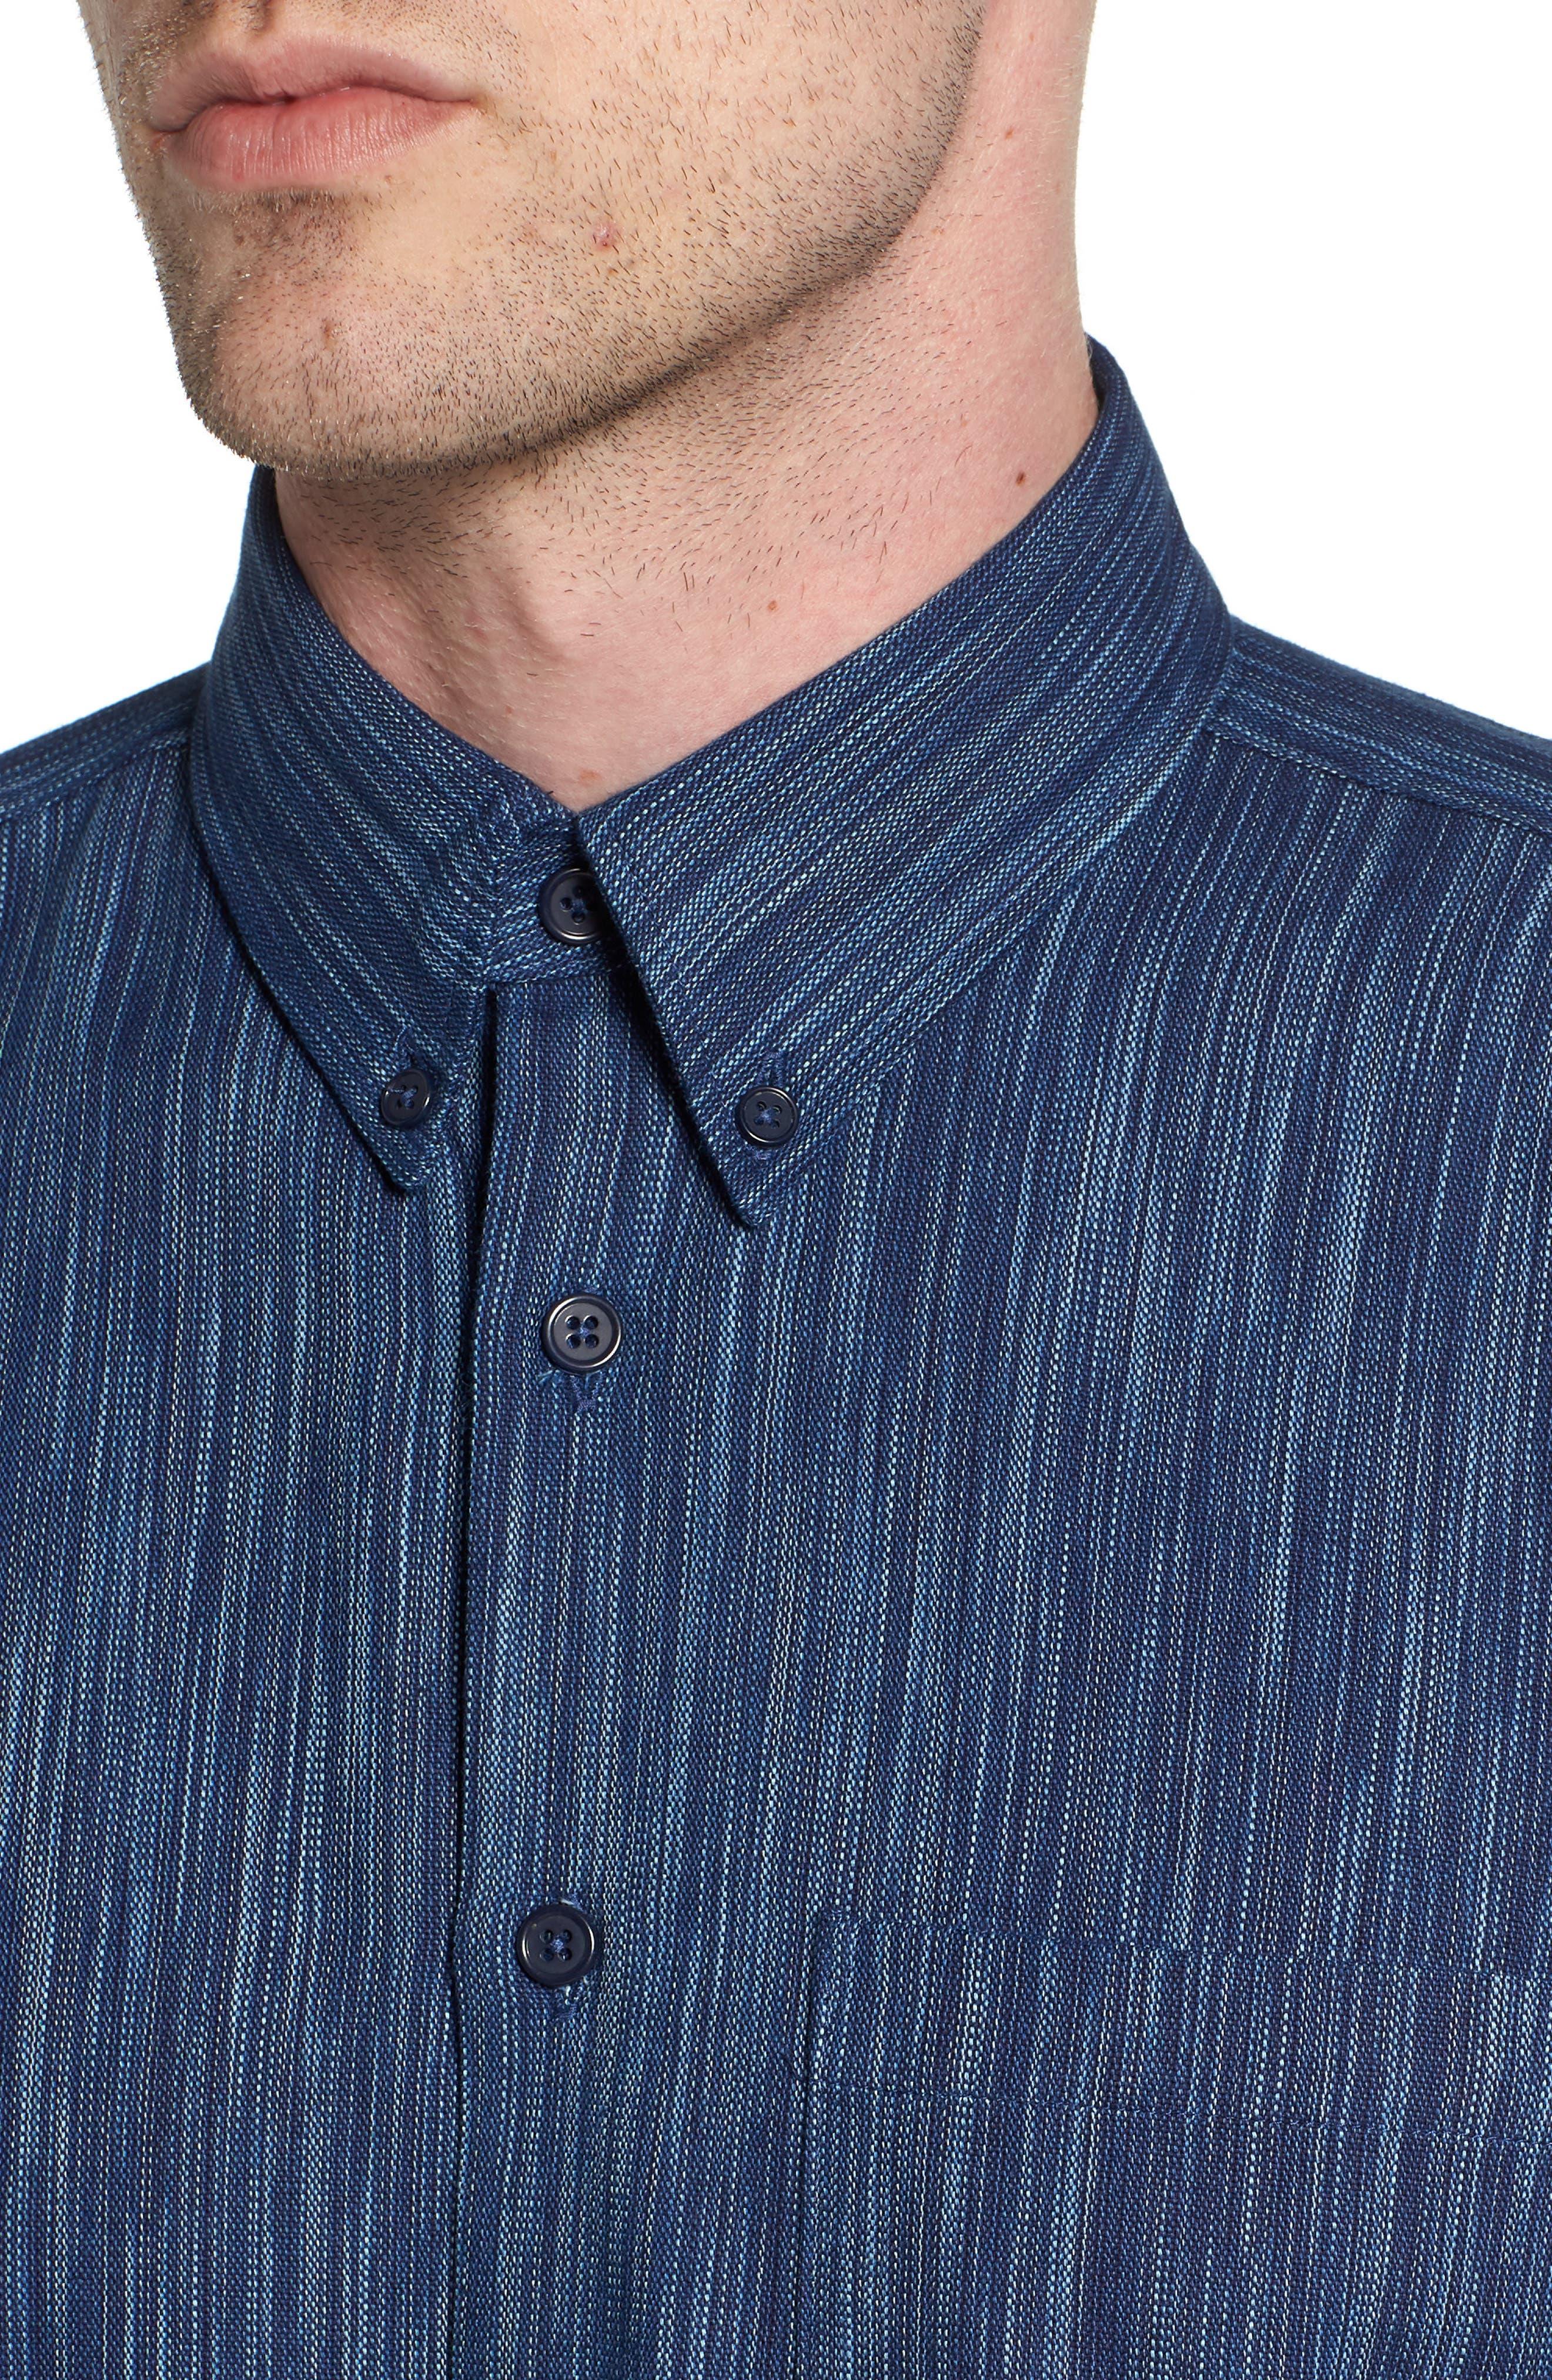 Indigo Tie Dye Rain Weave Shirt,                             Alternate thumbnail 4, color,                             401